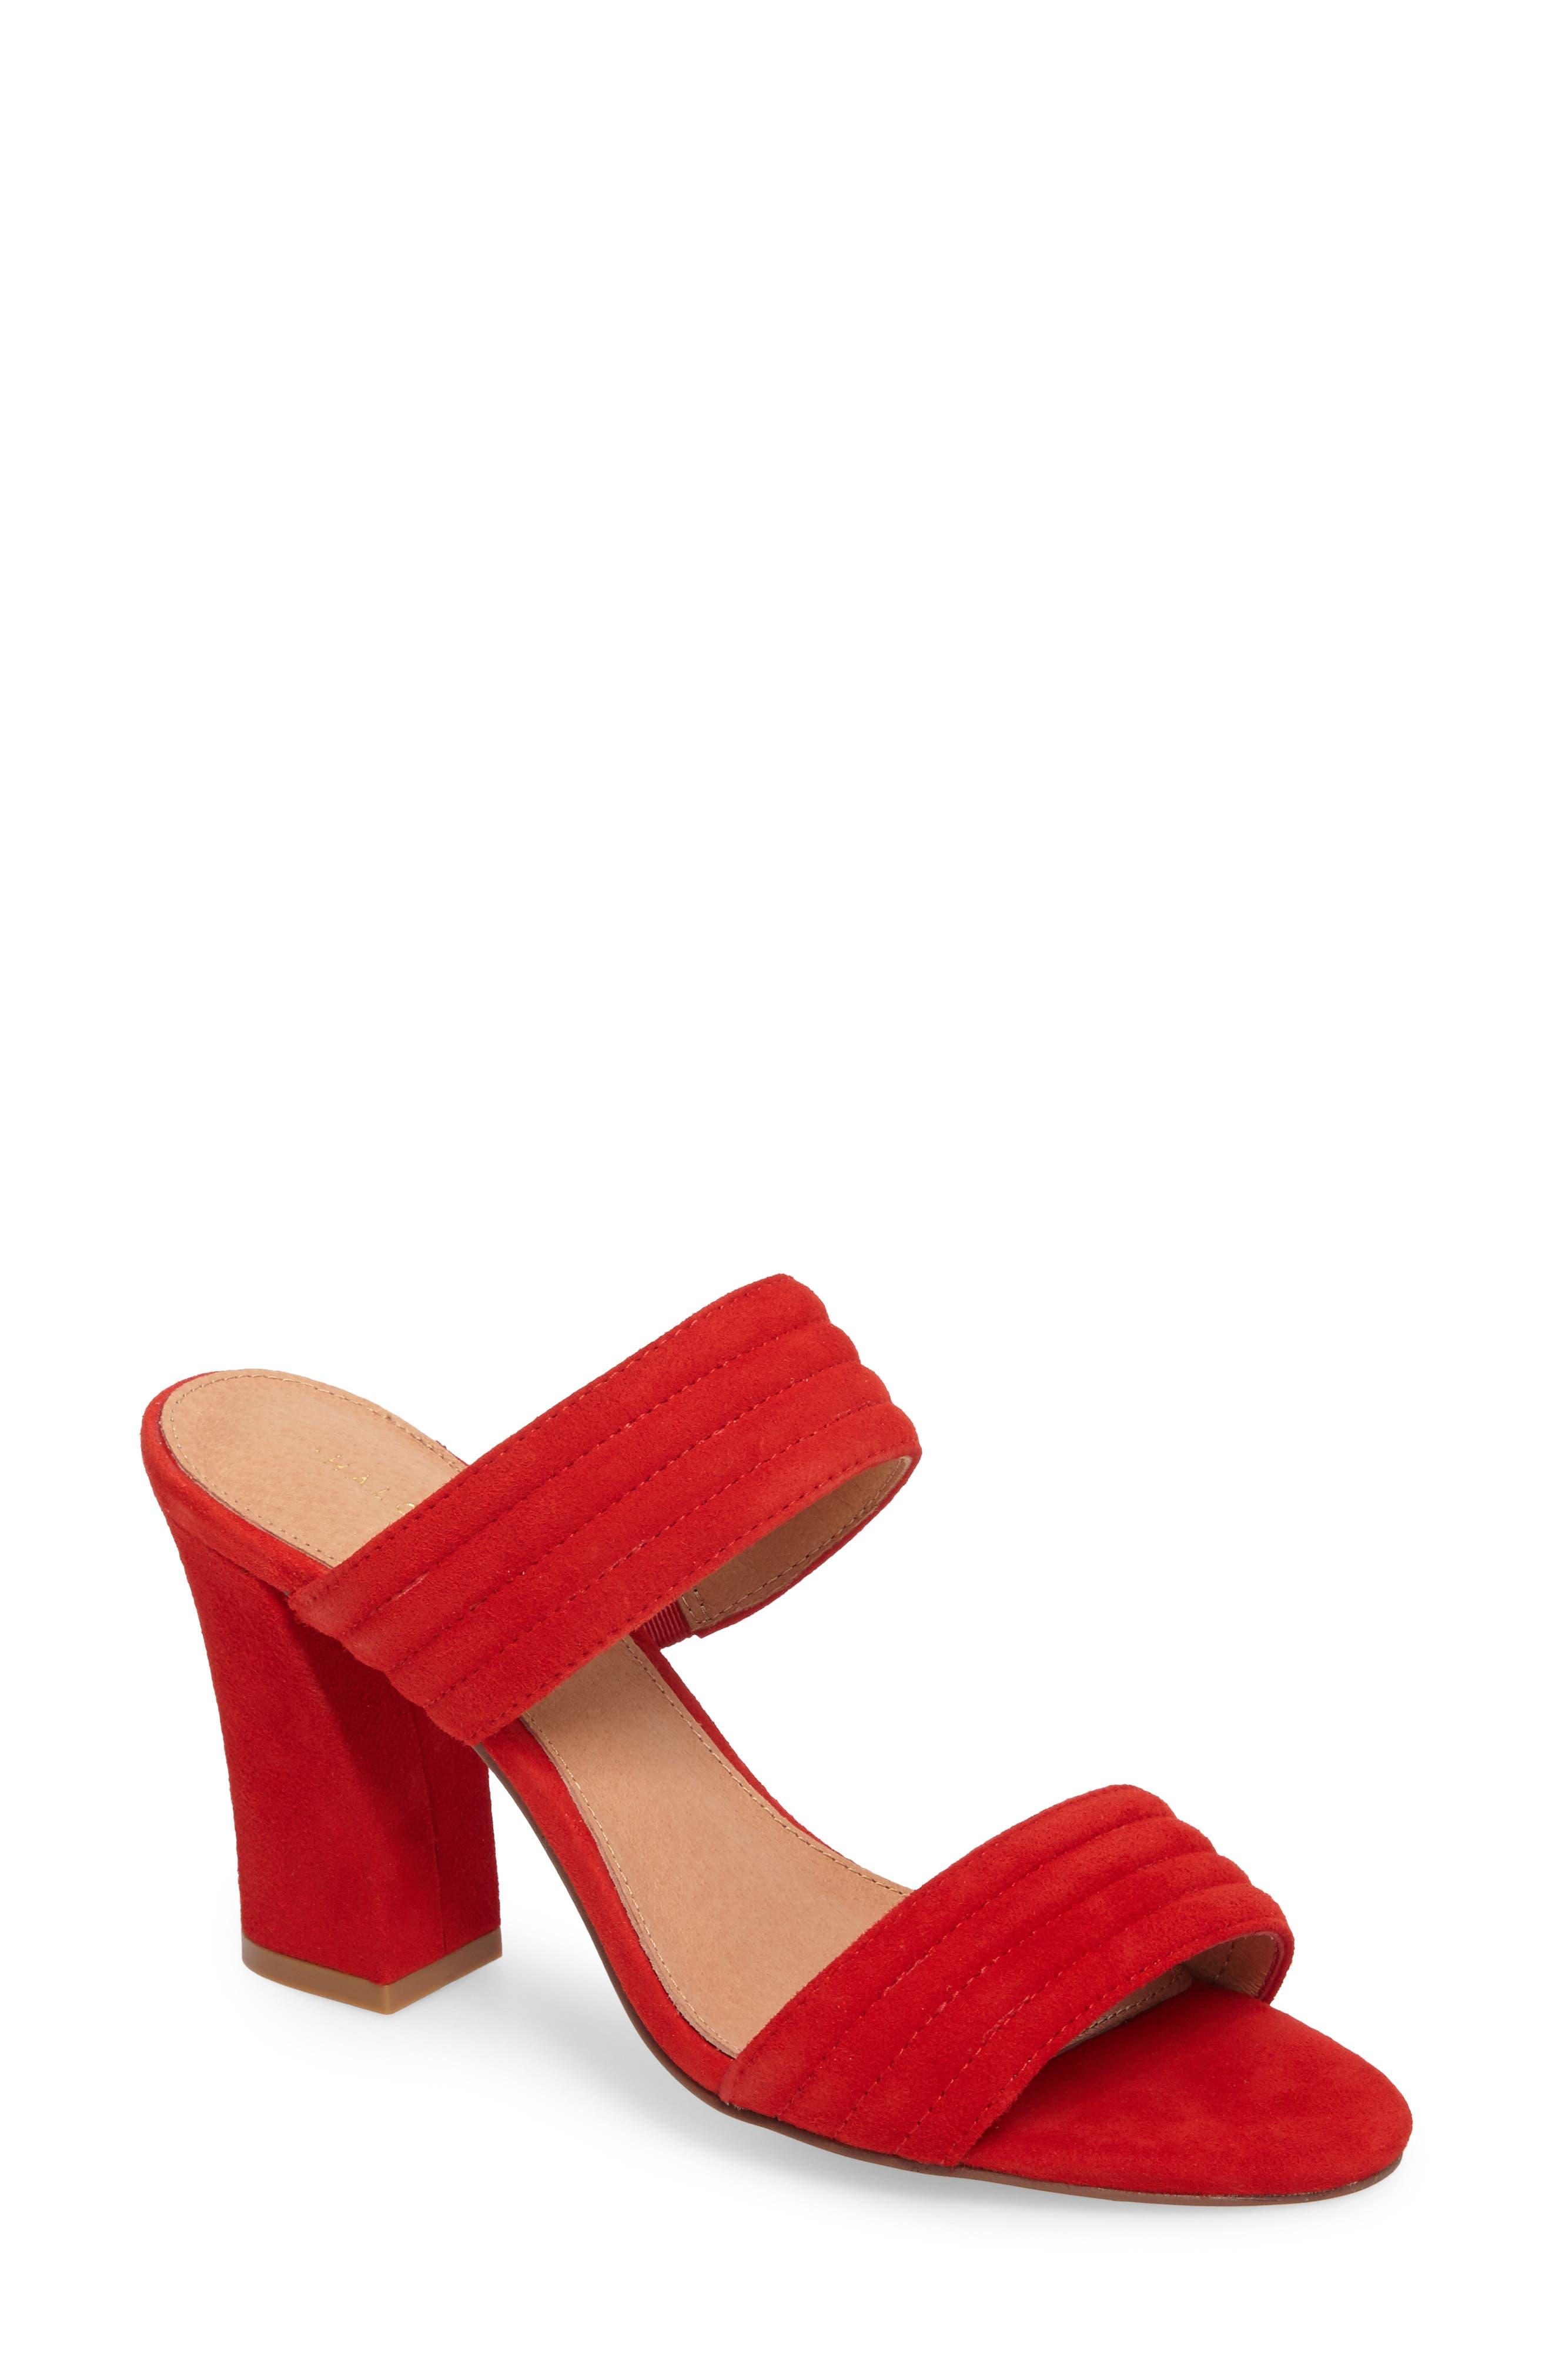 Della Slide Sandal,                             Main thumbnail 3, color,